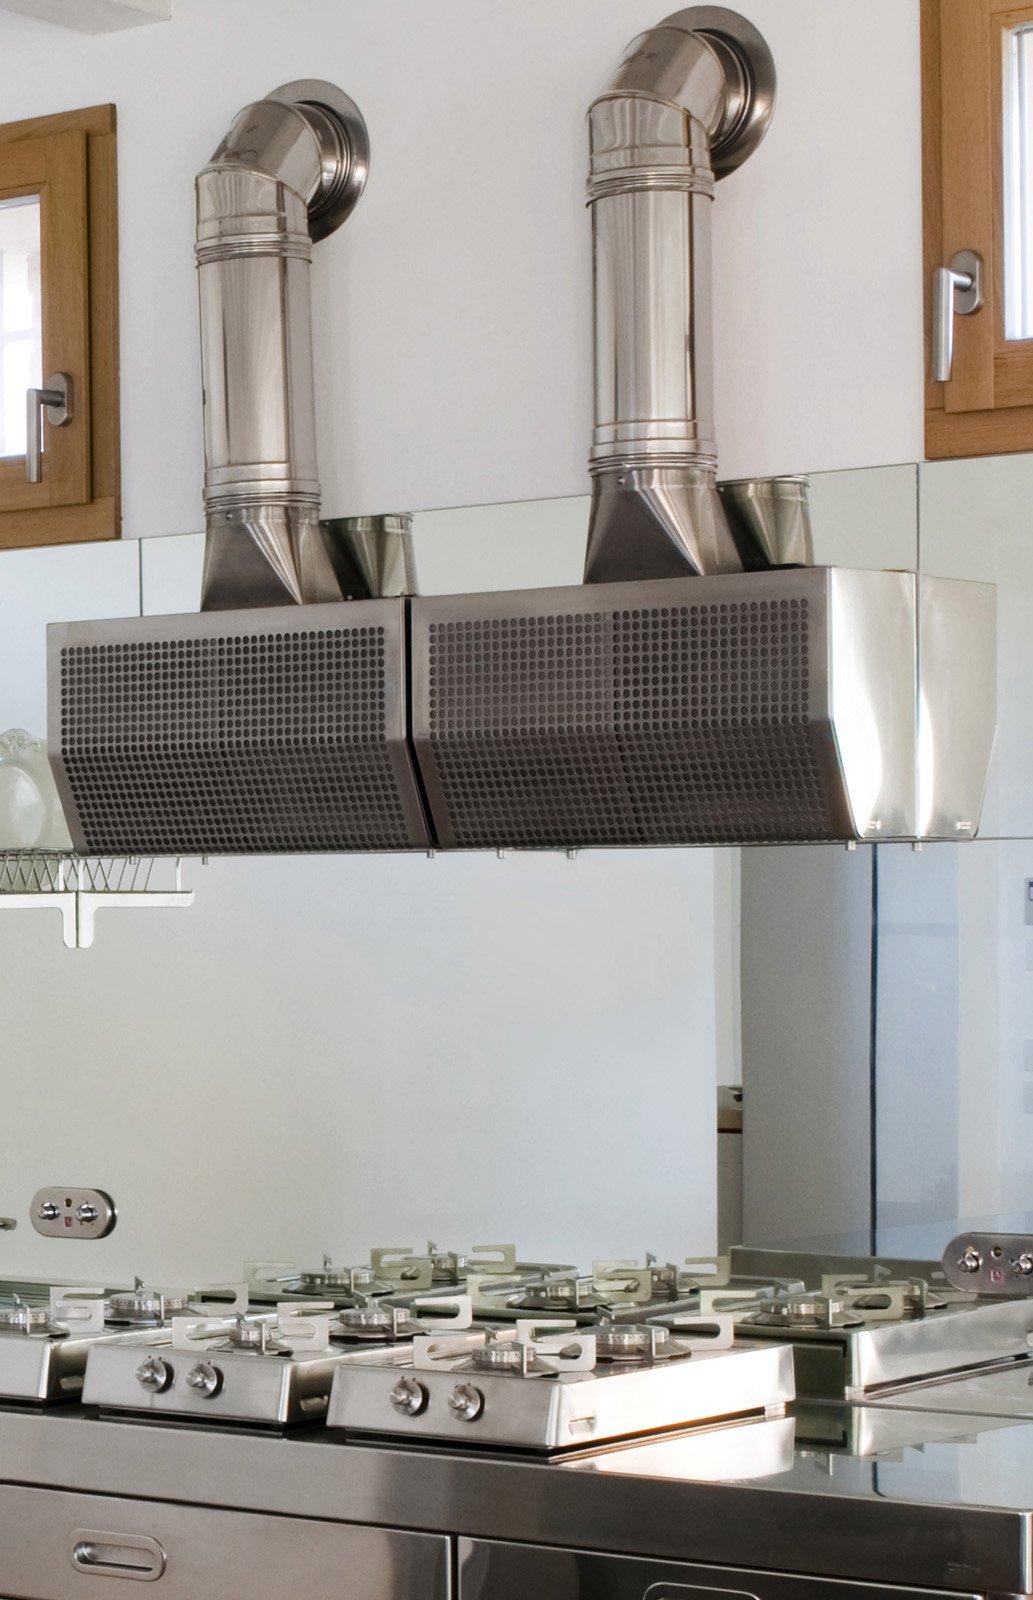 Cappe per la cucina cose di casa - Motore cappa aspirante cucina ...